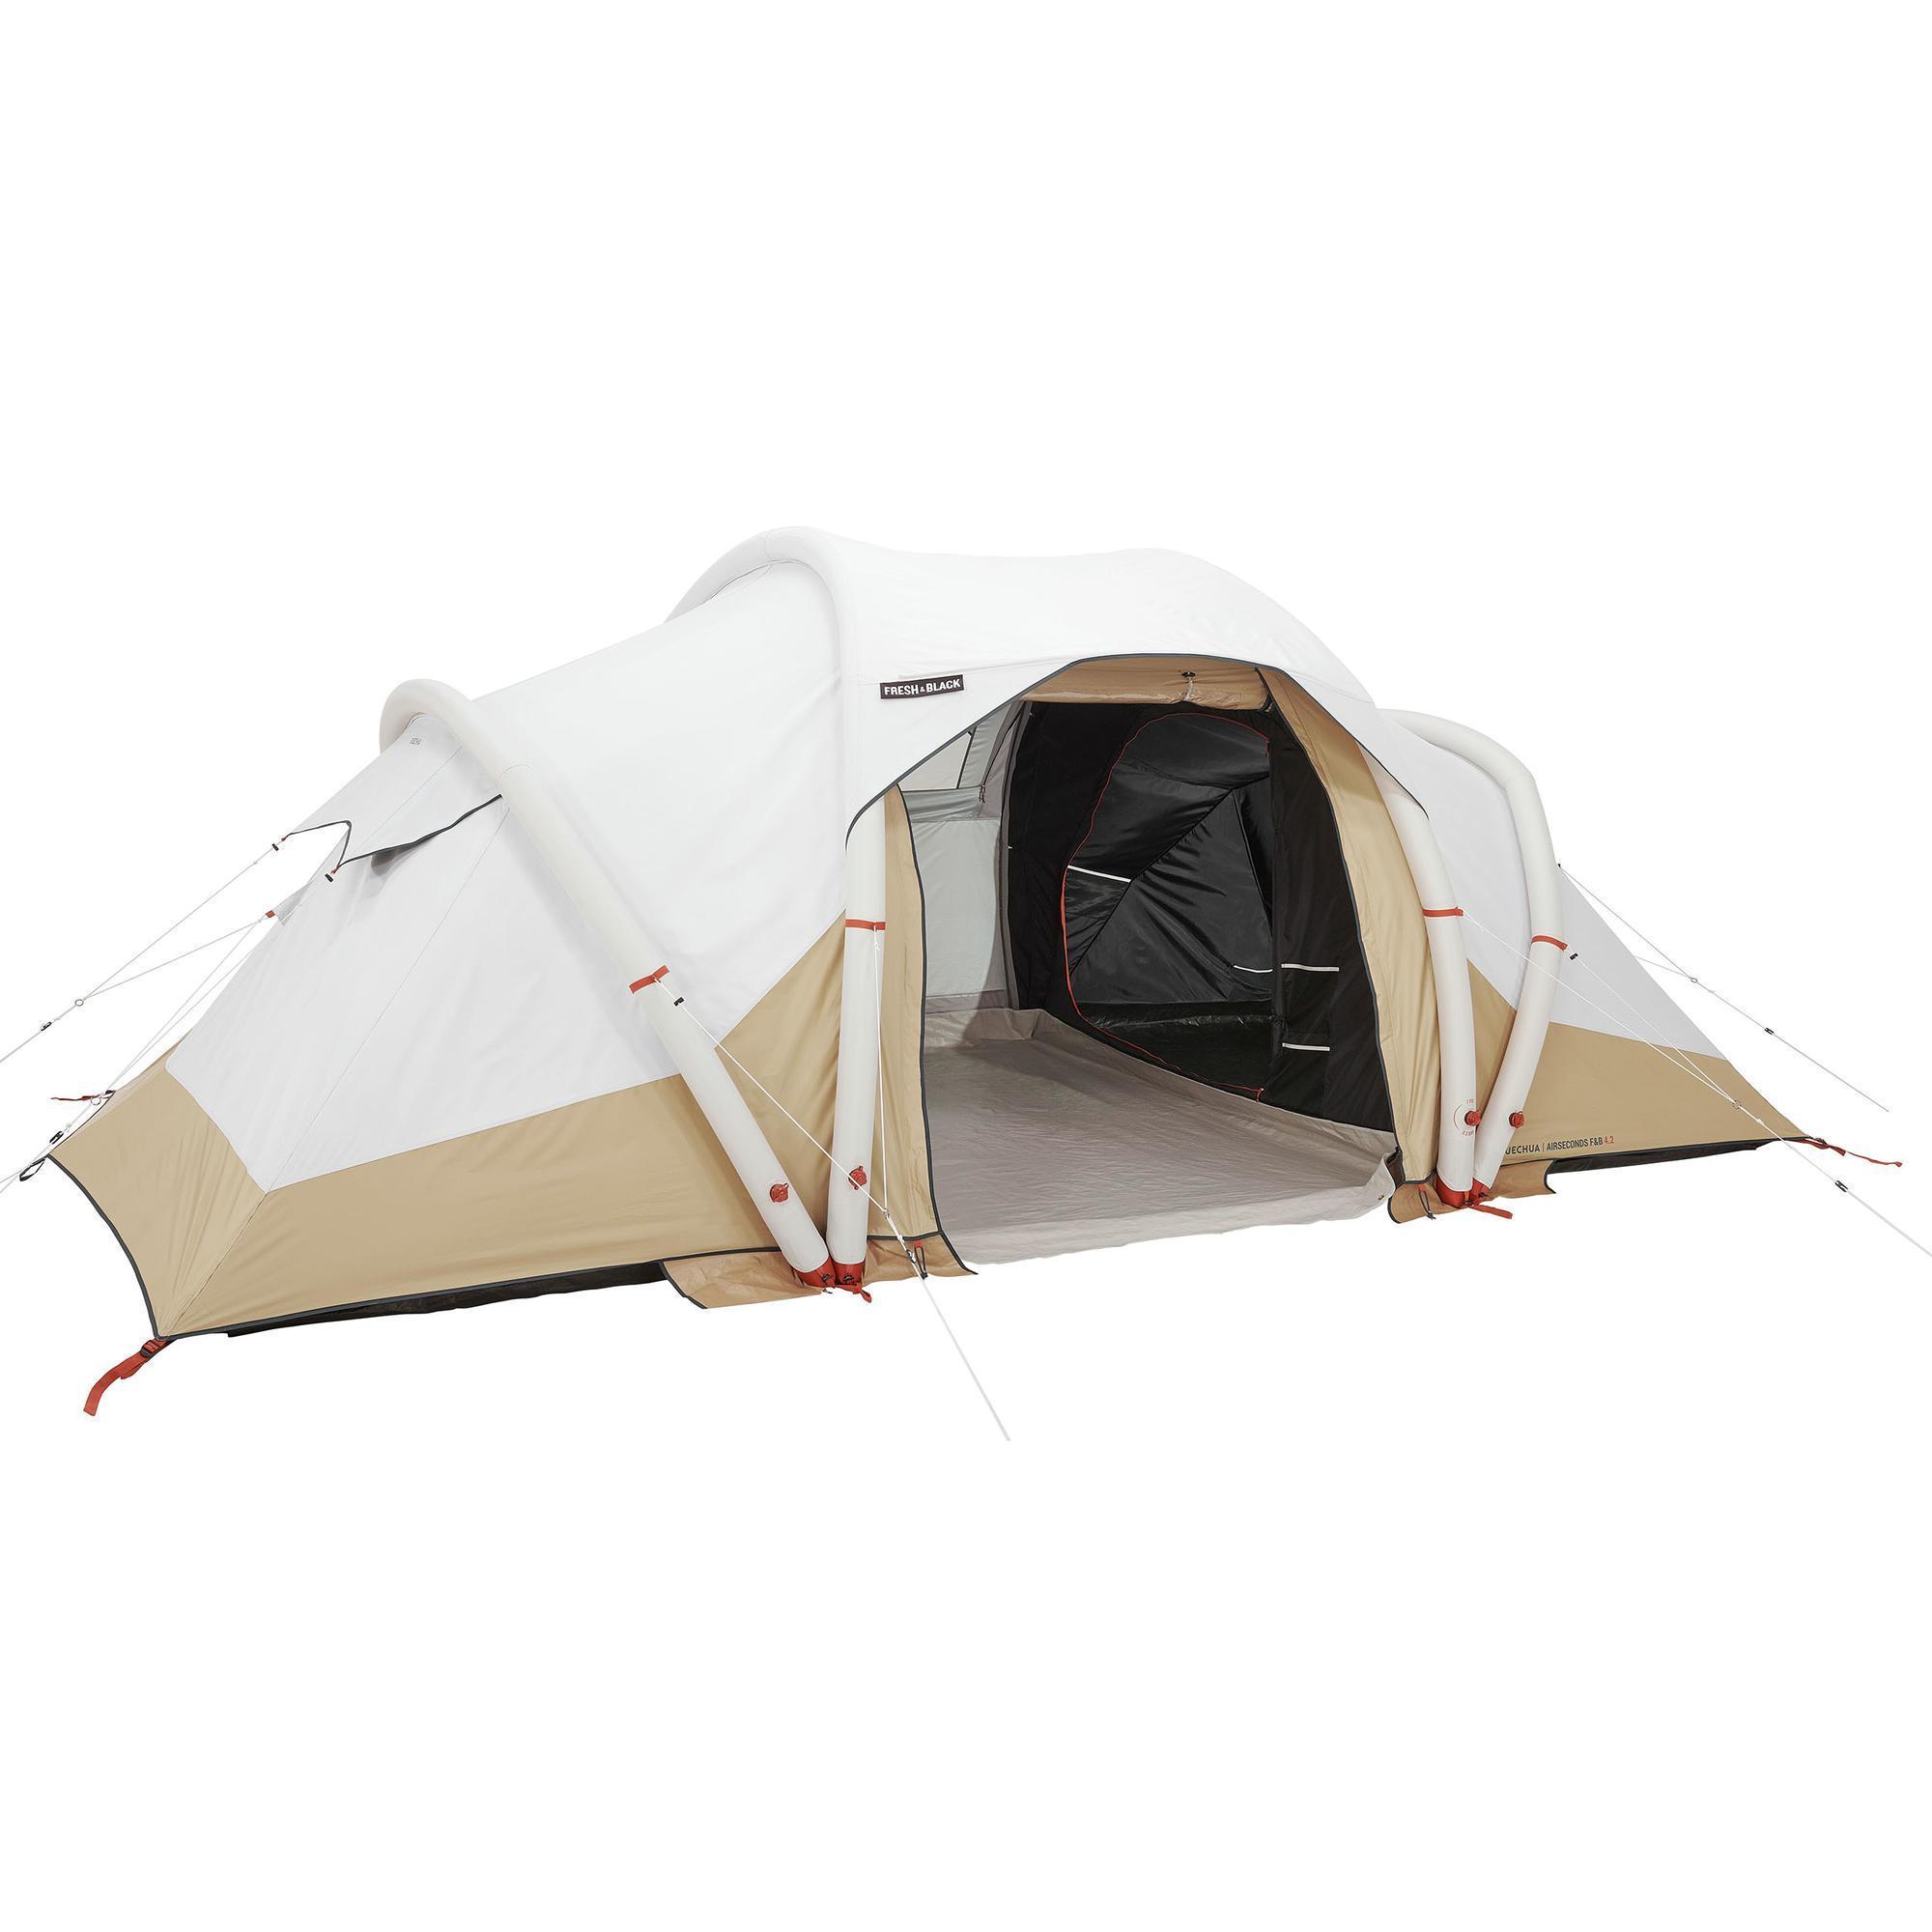 Camping Zubehor Campingausrustung Quechua Decathlon